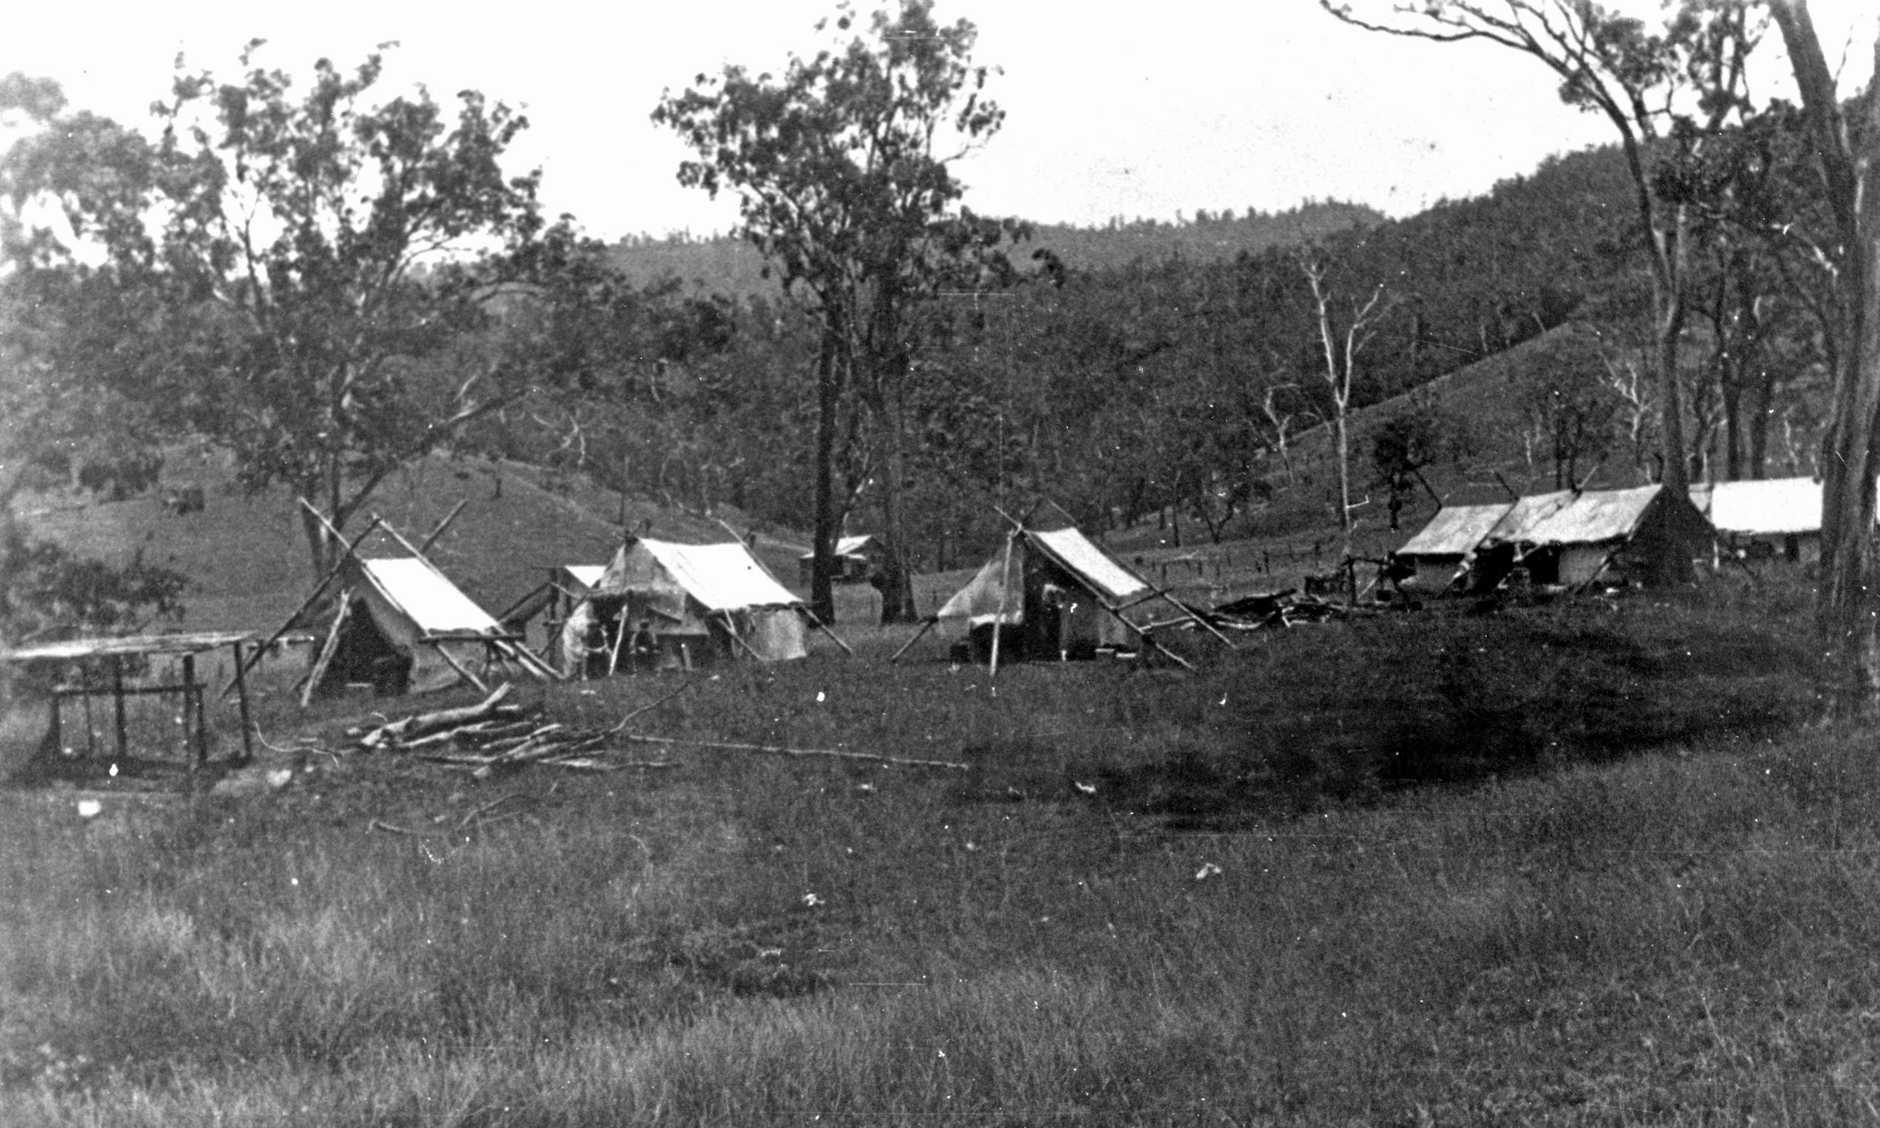 P87510 - WWII Soldier's camp, Elaman Creek, Conondale, ca 1942.